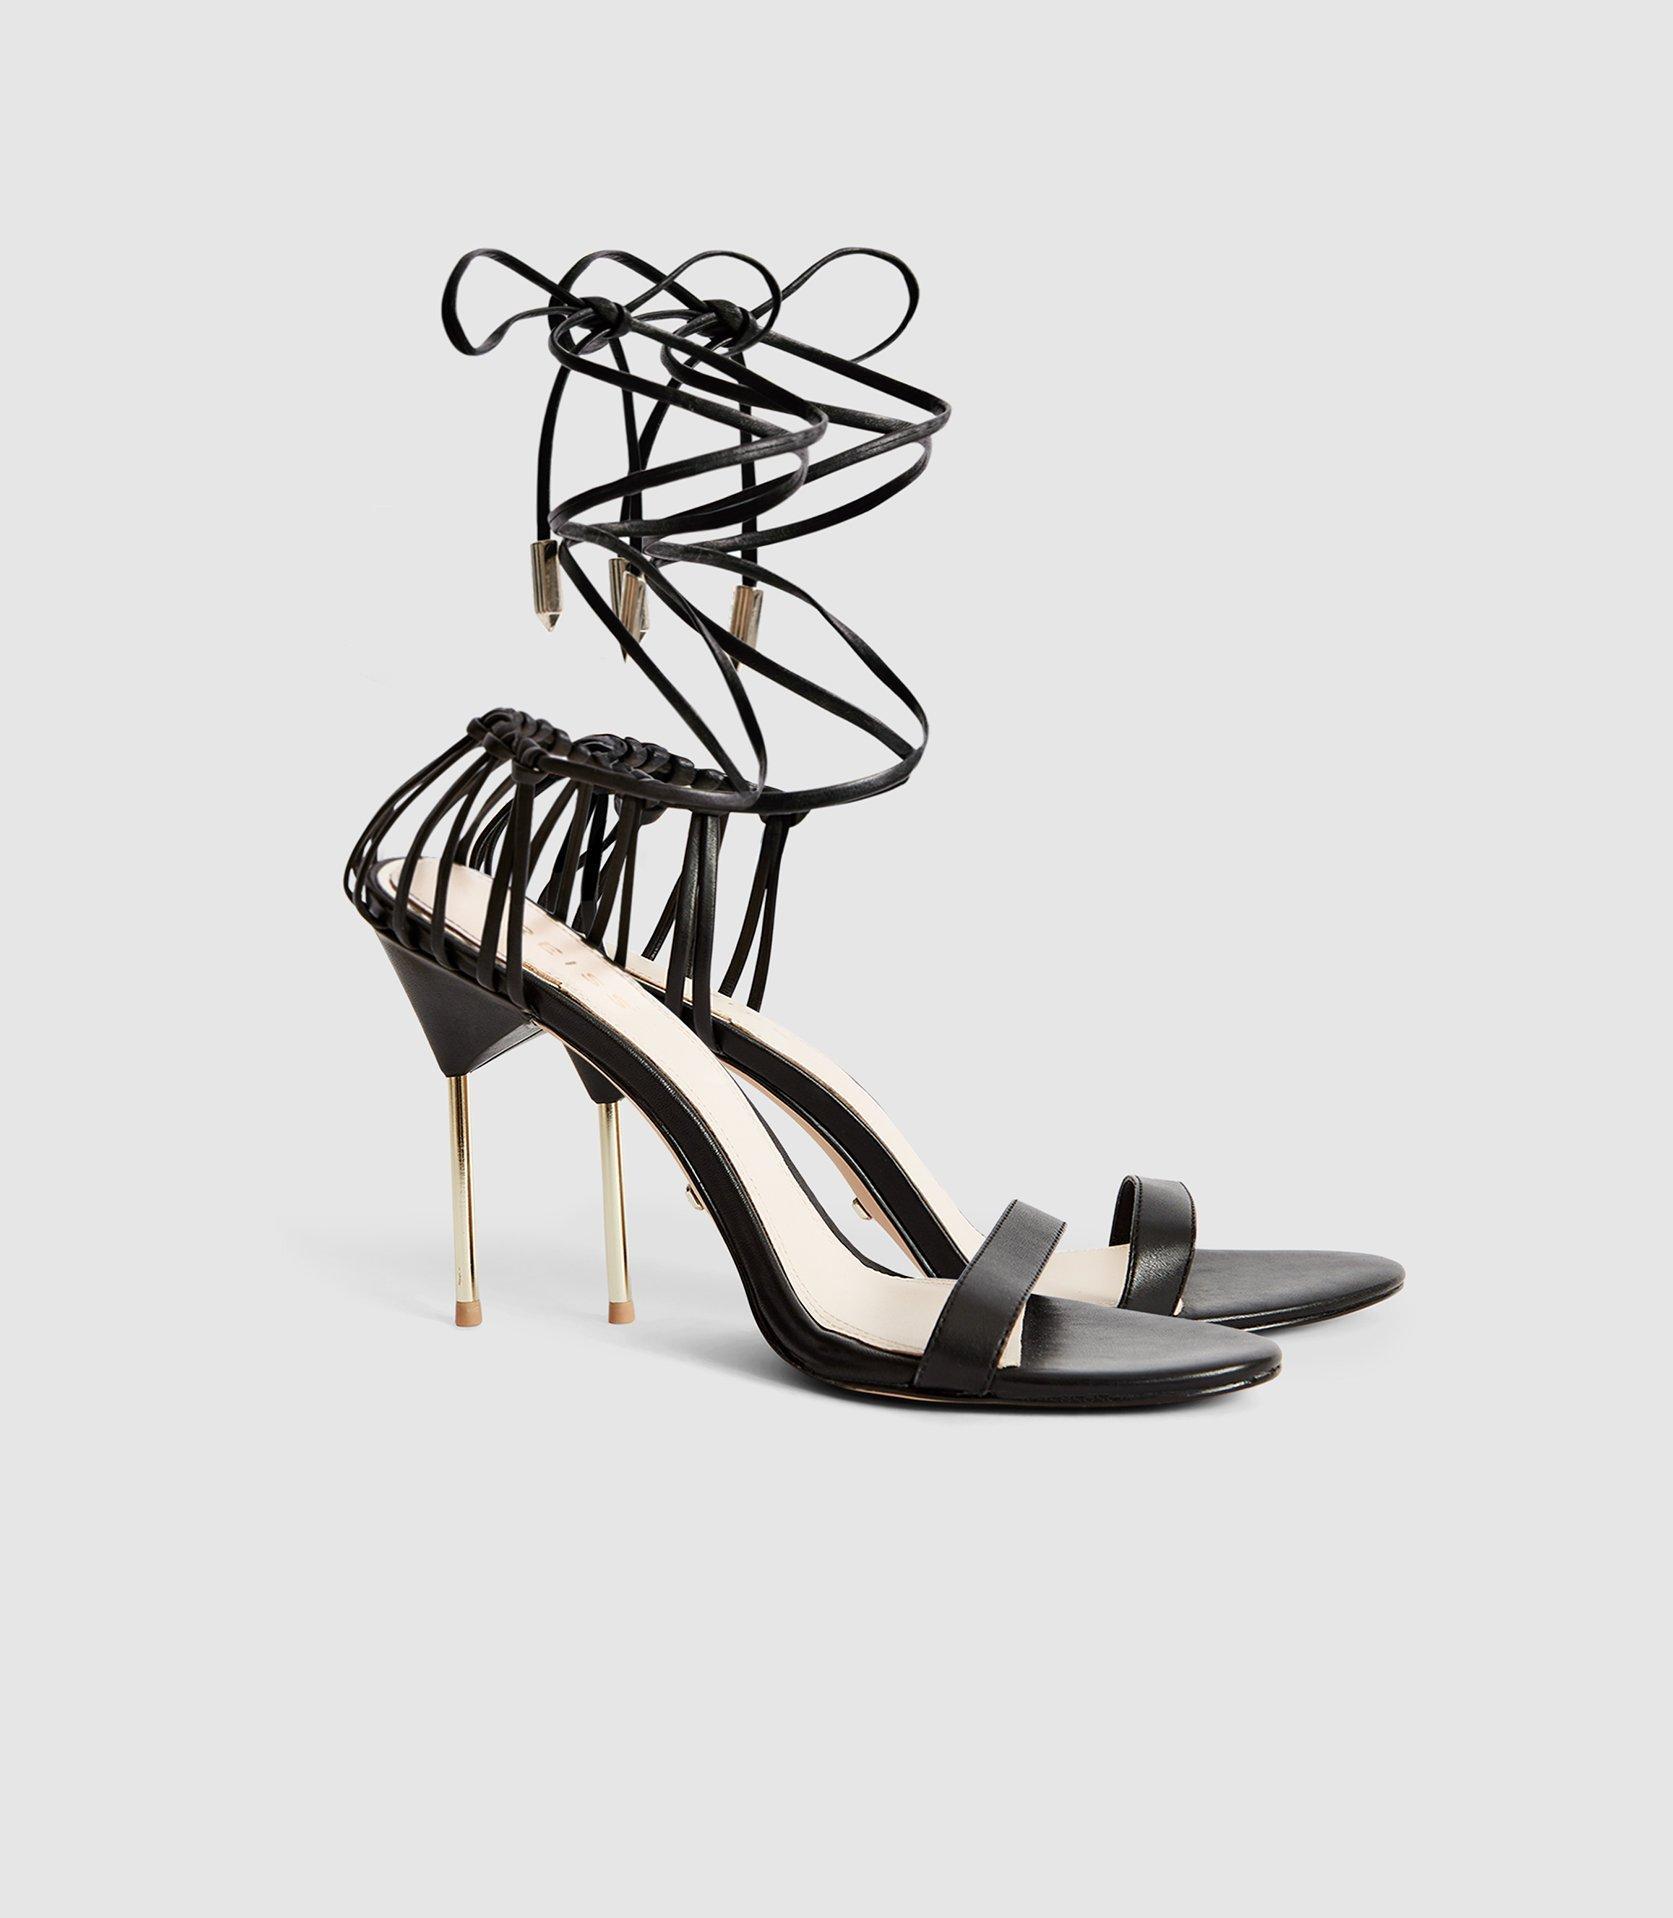 b26f93bce1 Reiss - Black Zhane - Leather Strappy Wrap Sandals - Lyst. View fullscreen